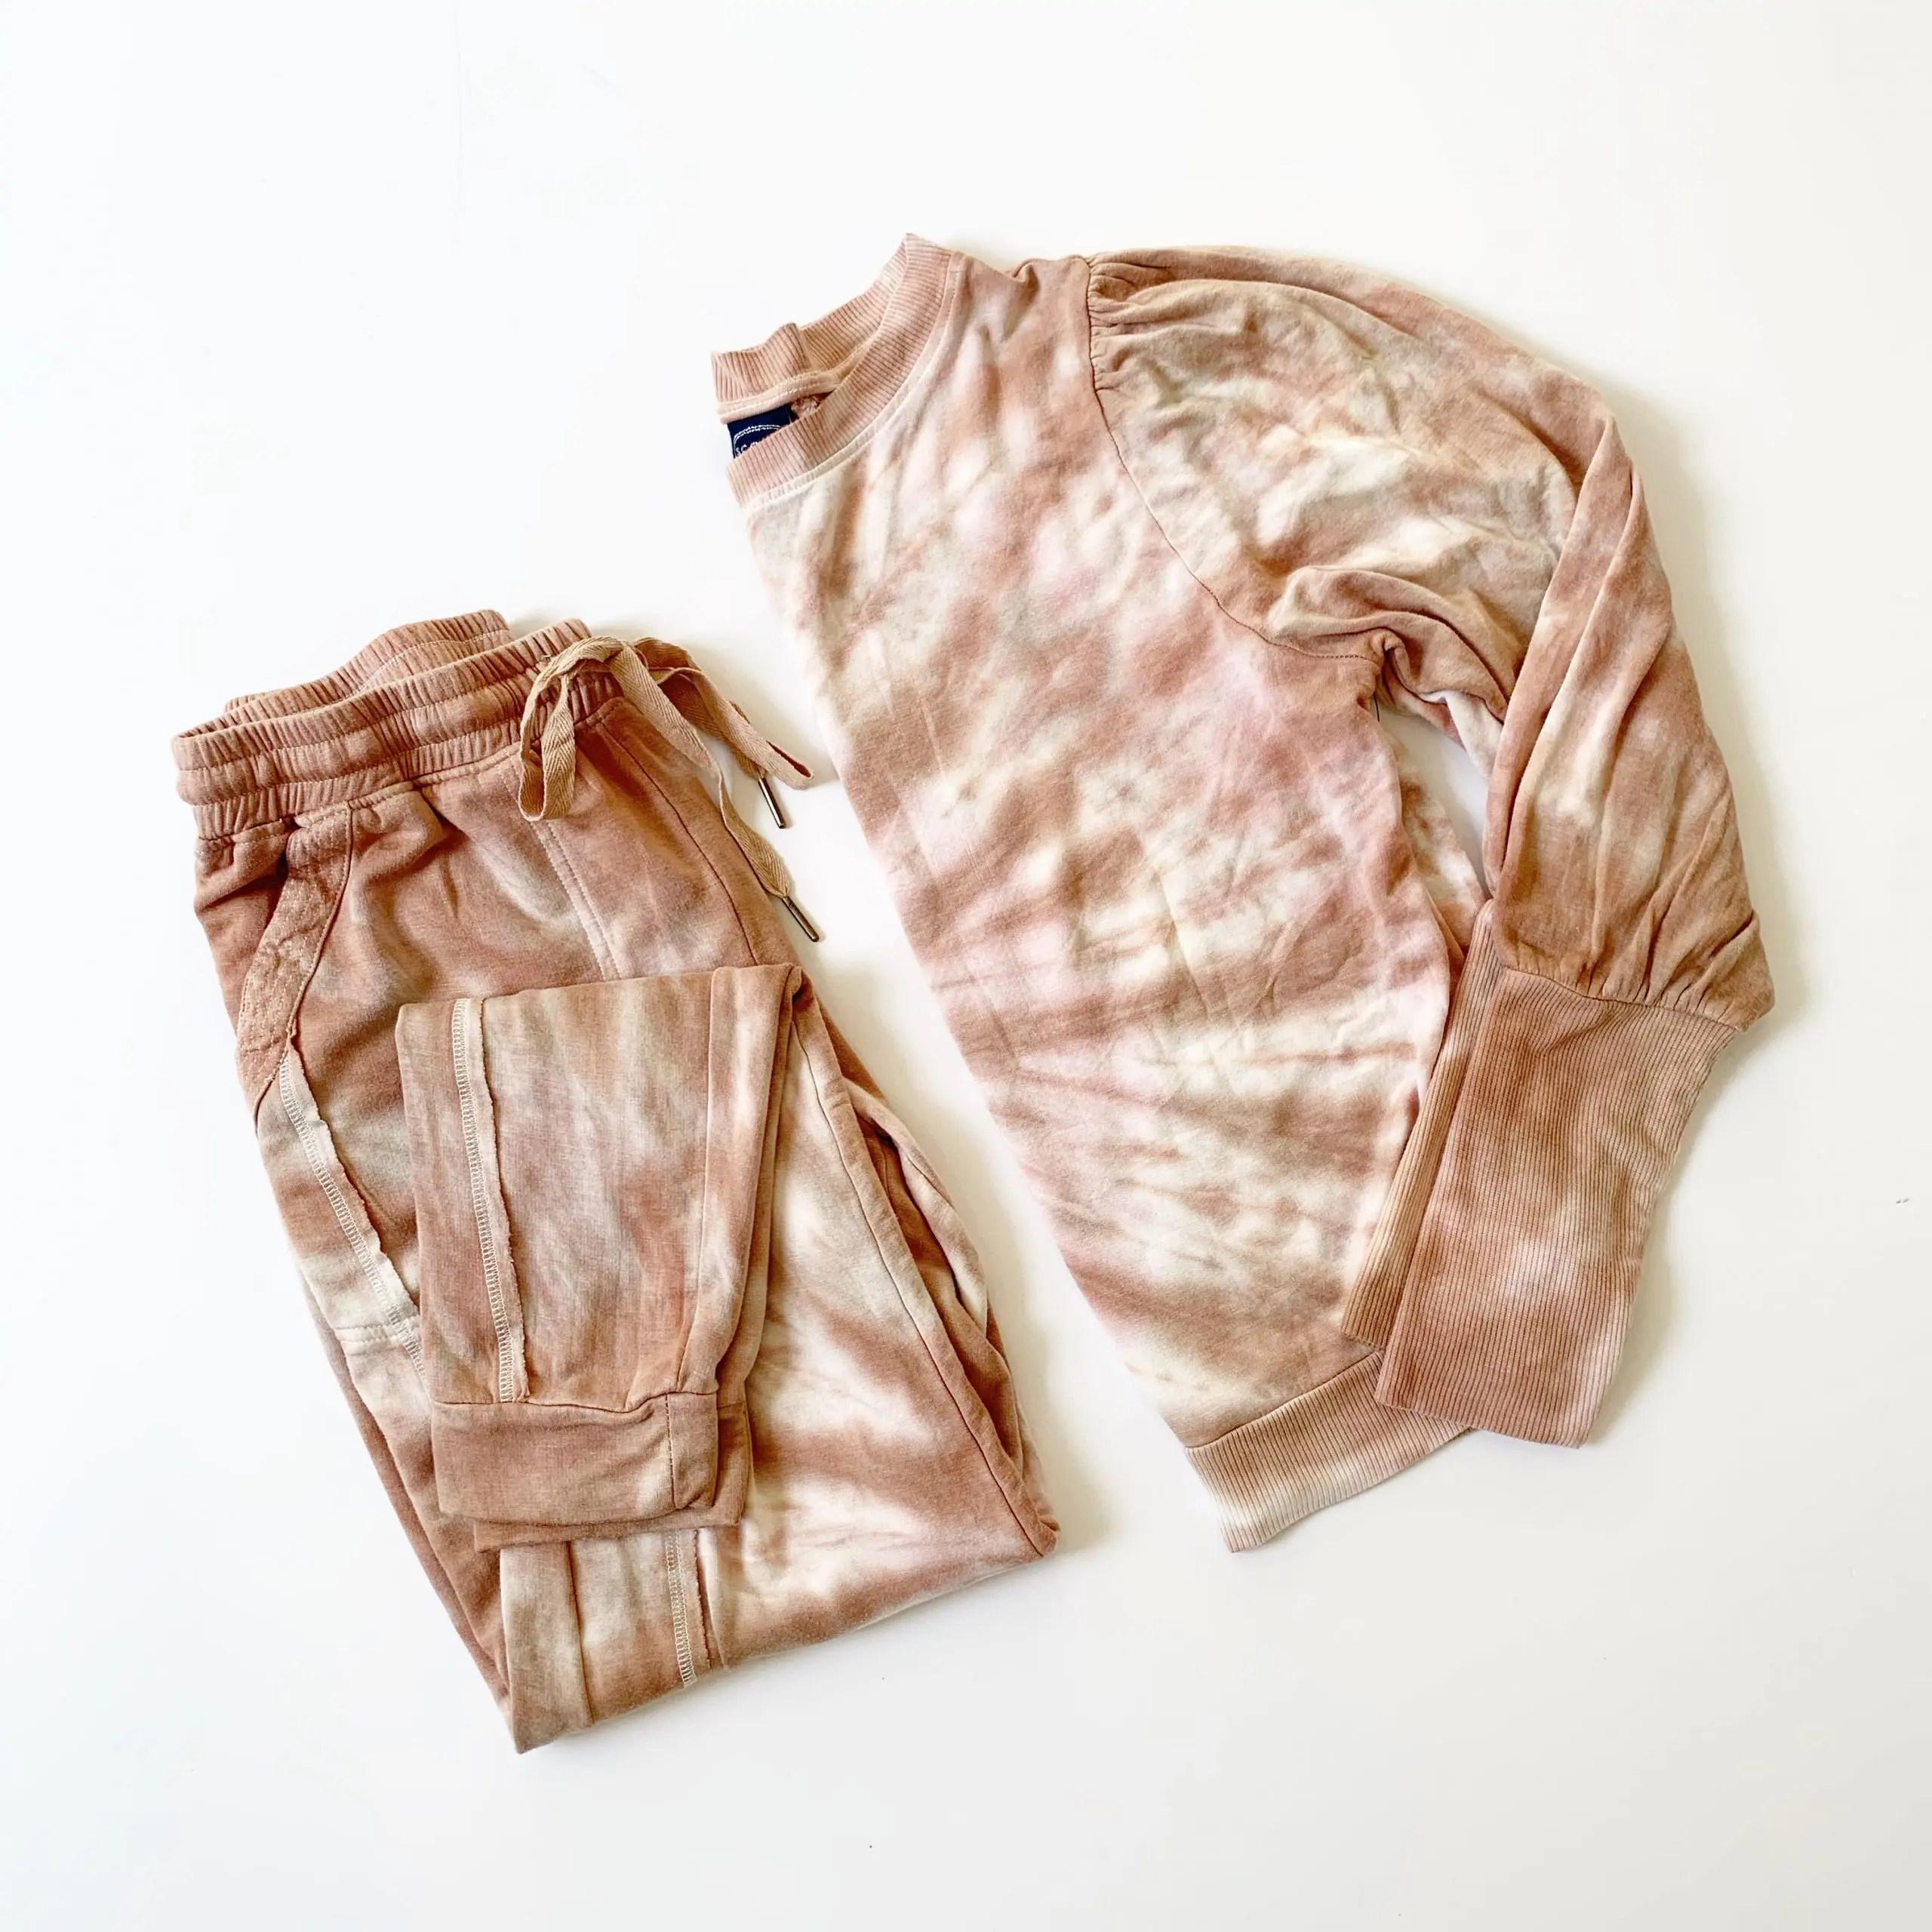 Scoop Tie Dye Joggers and Puff Sleeve Sweatshirt